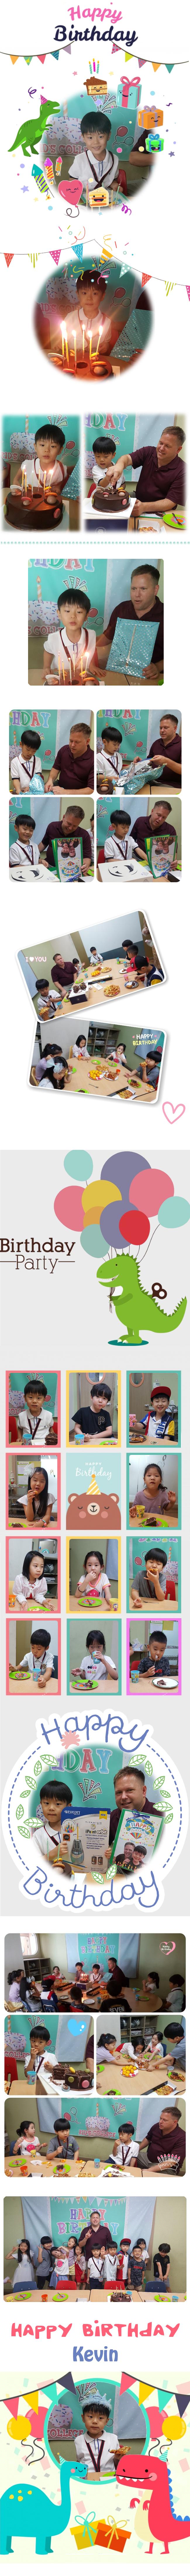 James_Birthday_Kevin.jpg